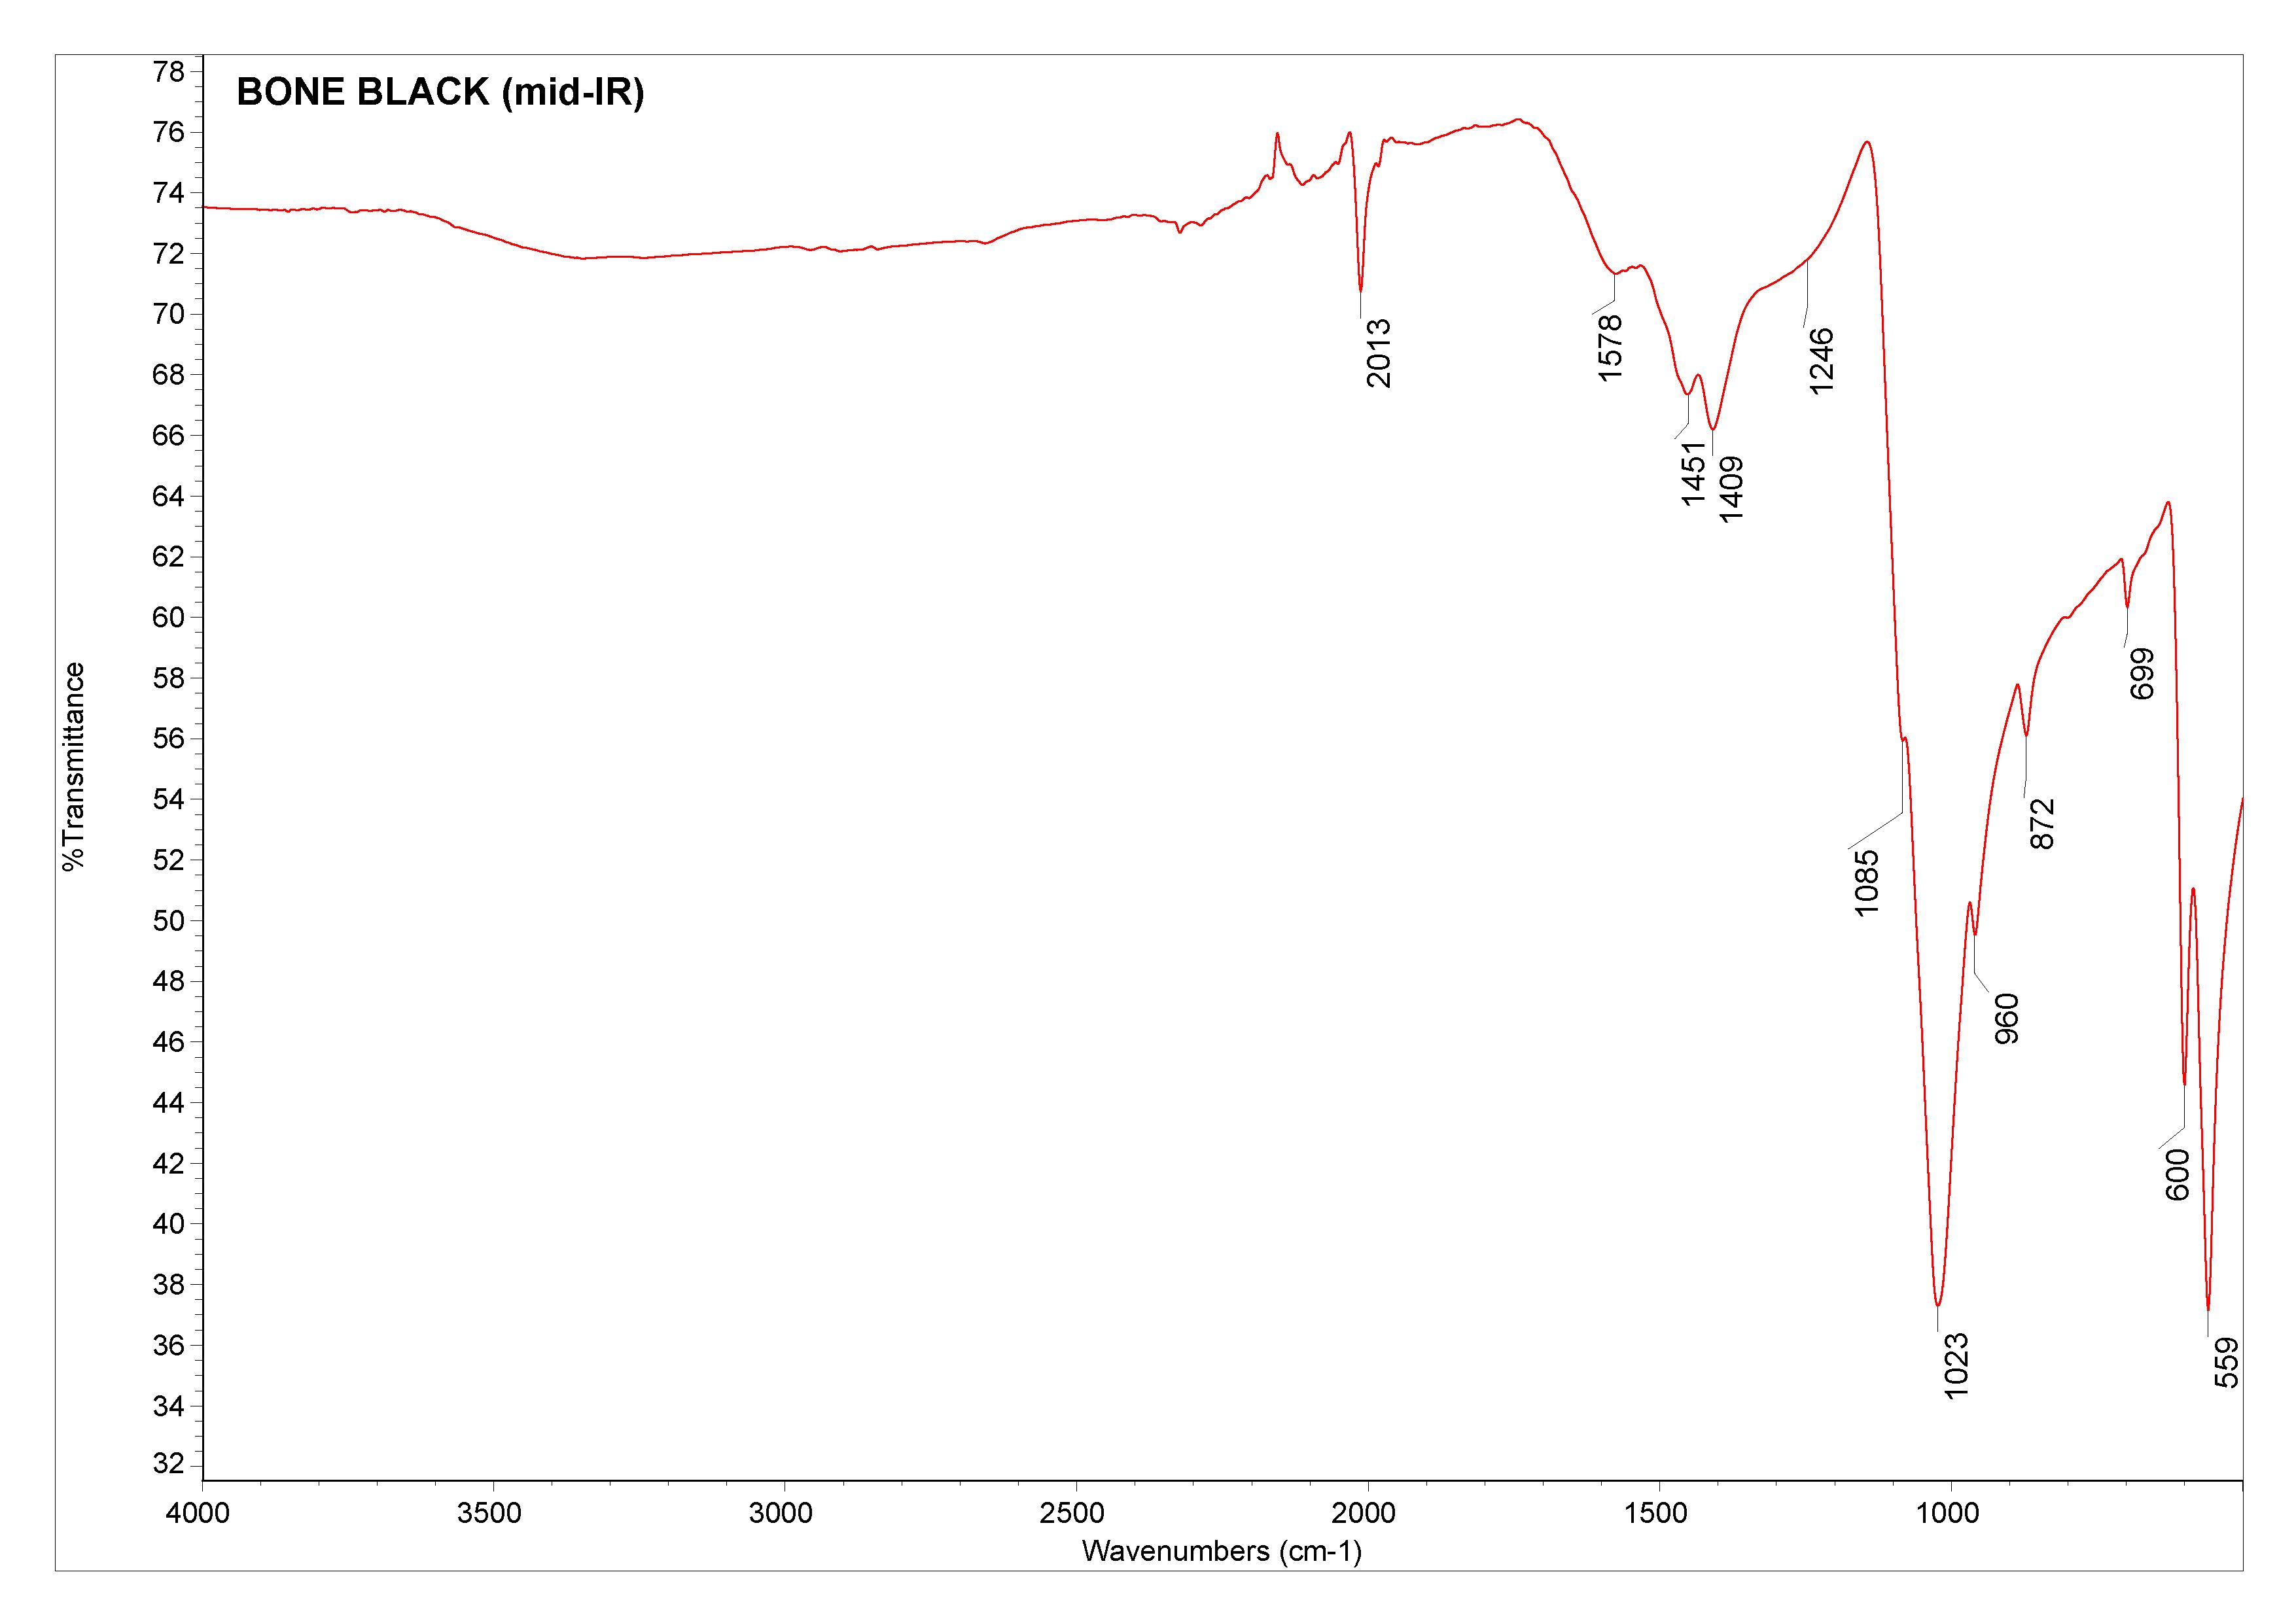 Bone black (mid-IR)